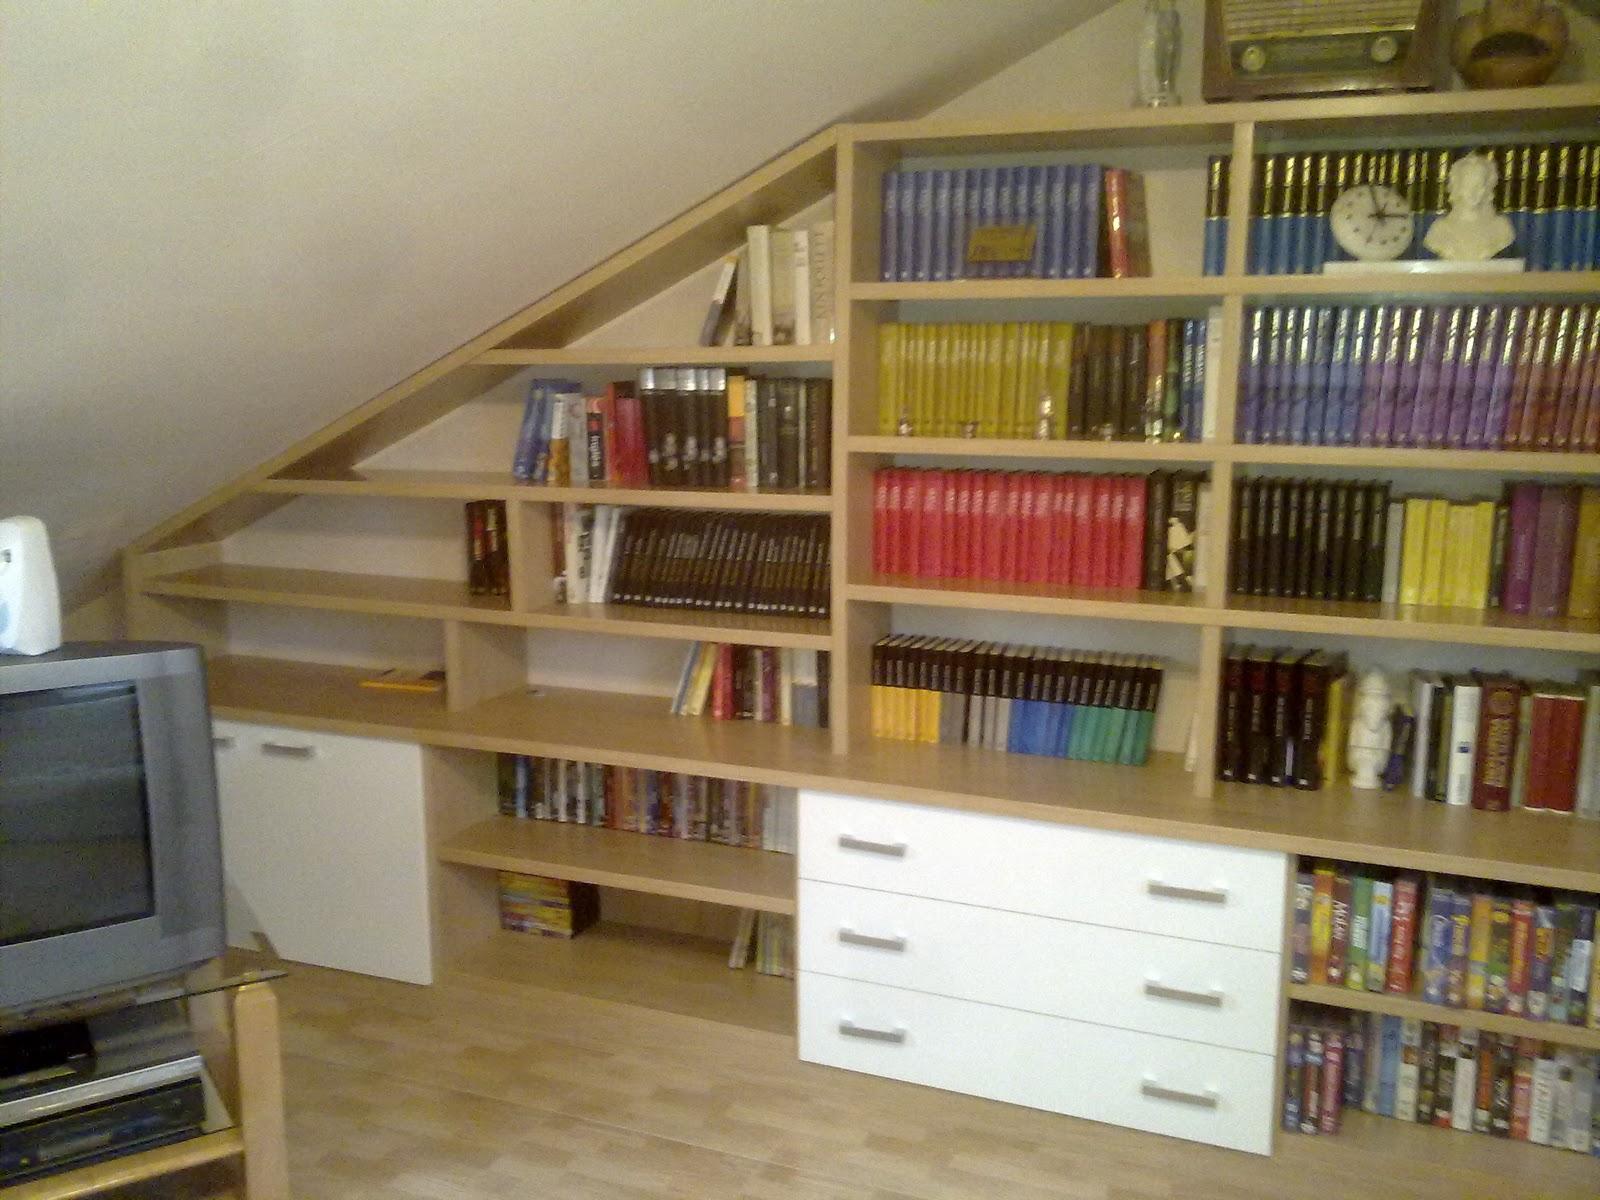 Muebles a medida librerias a medida - Librerias a medida ...